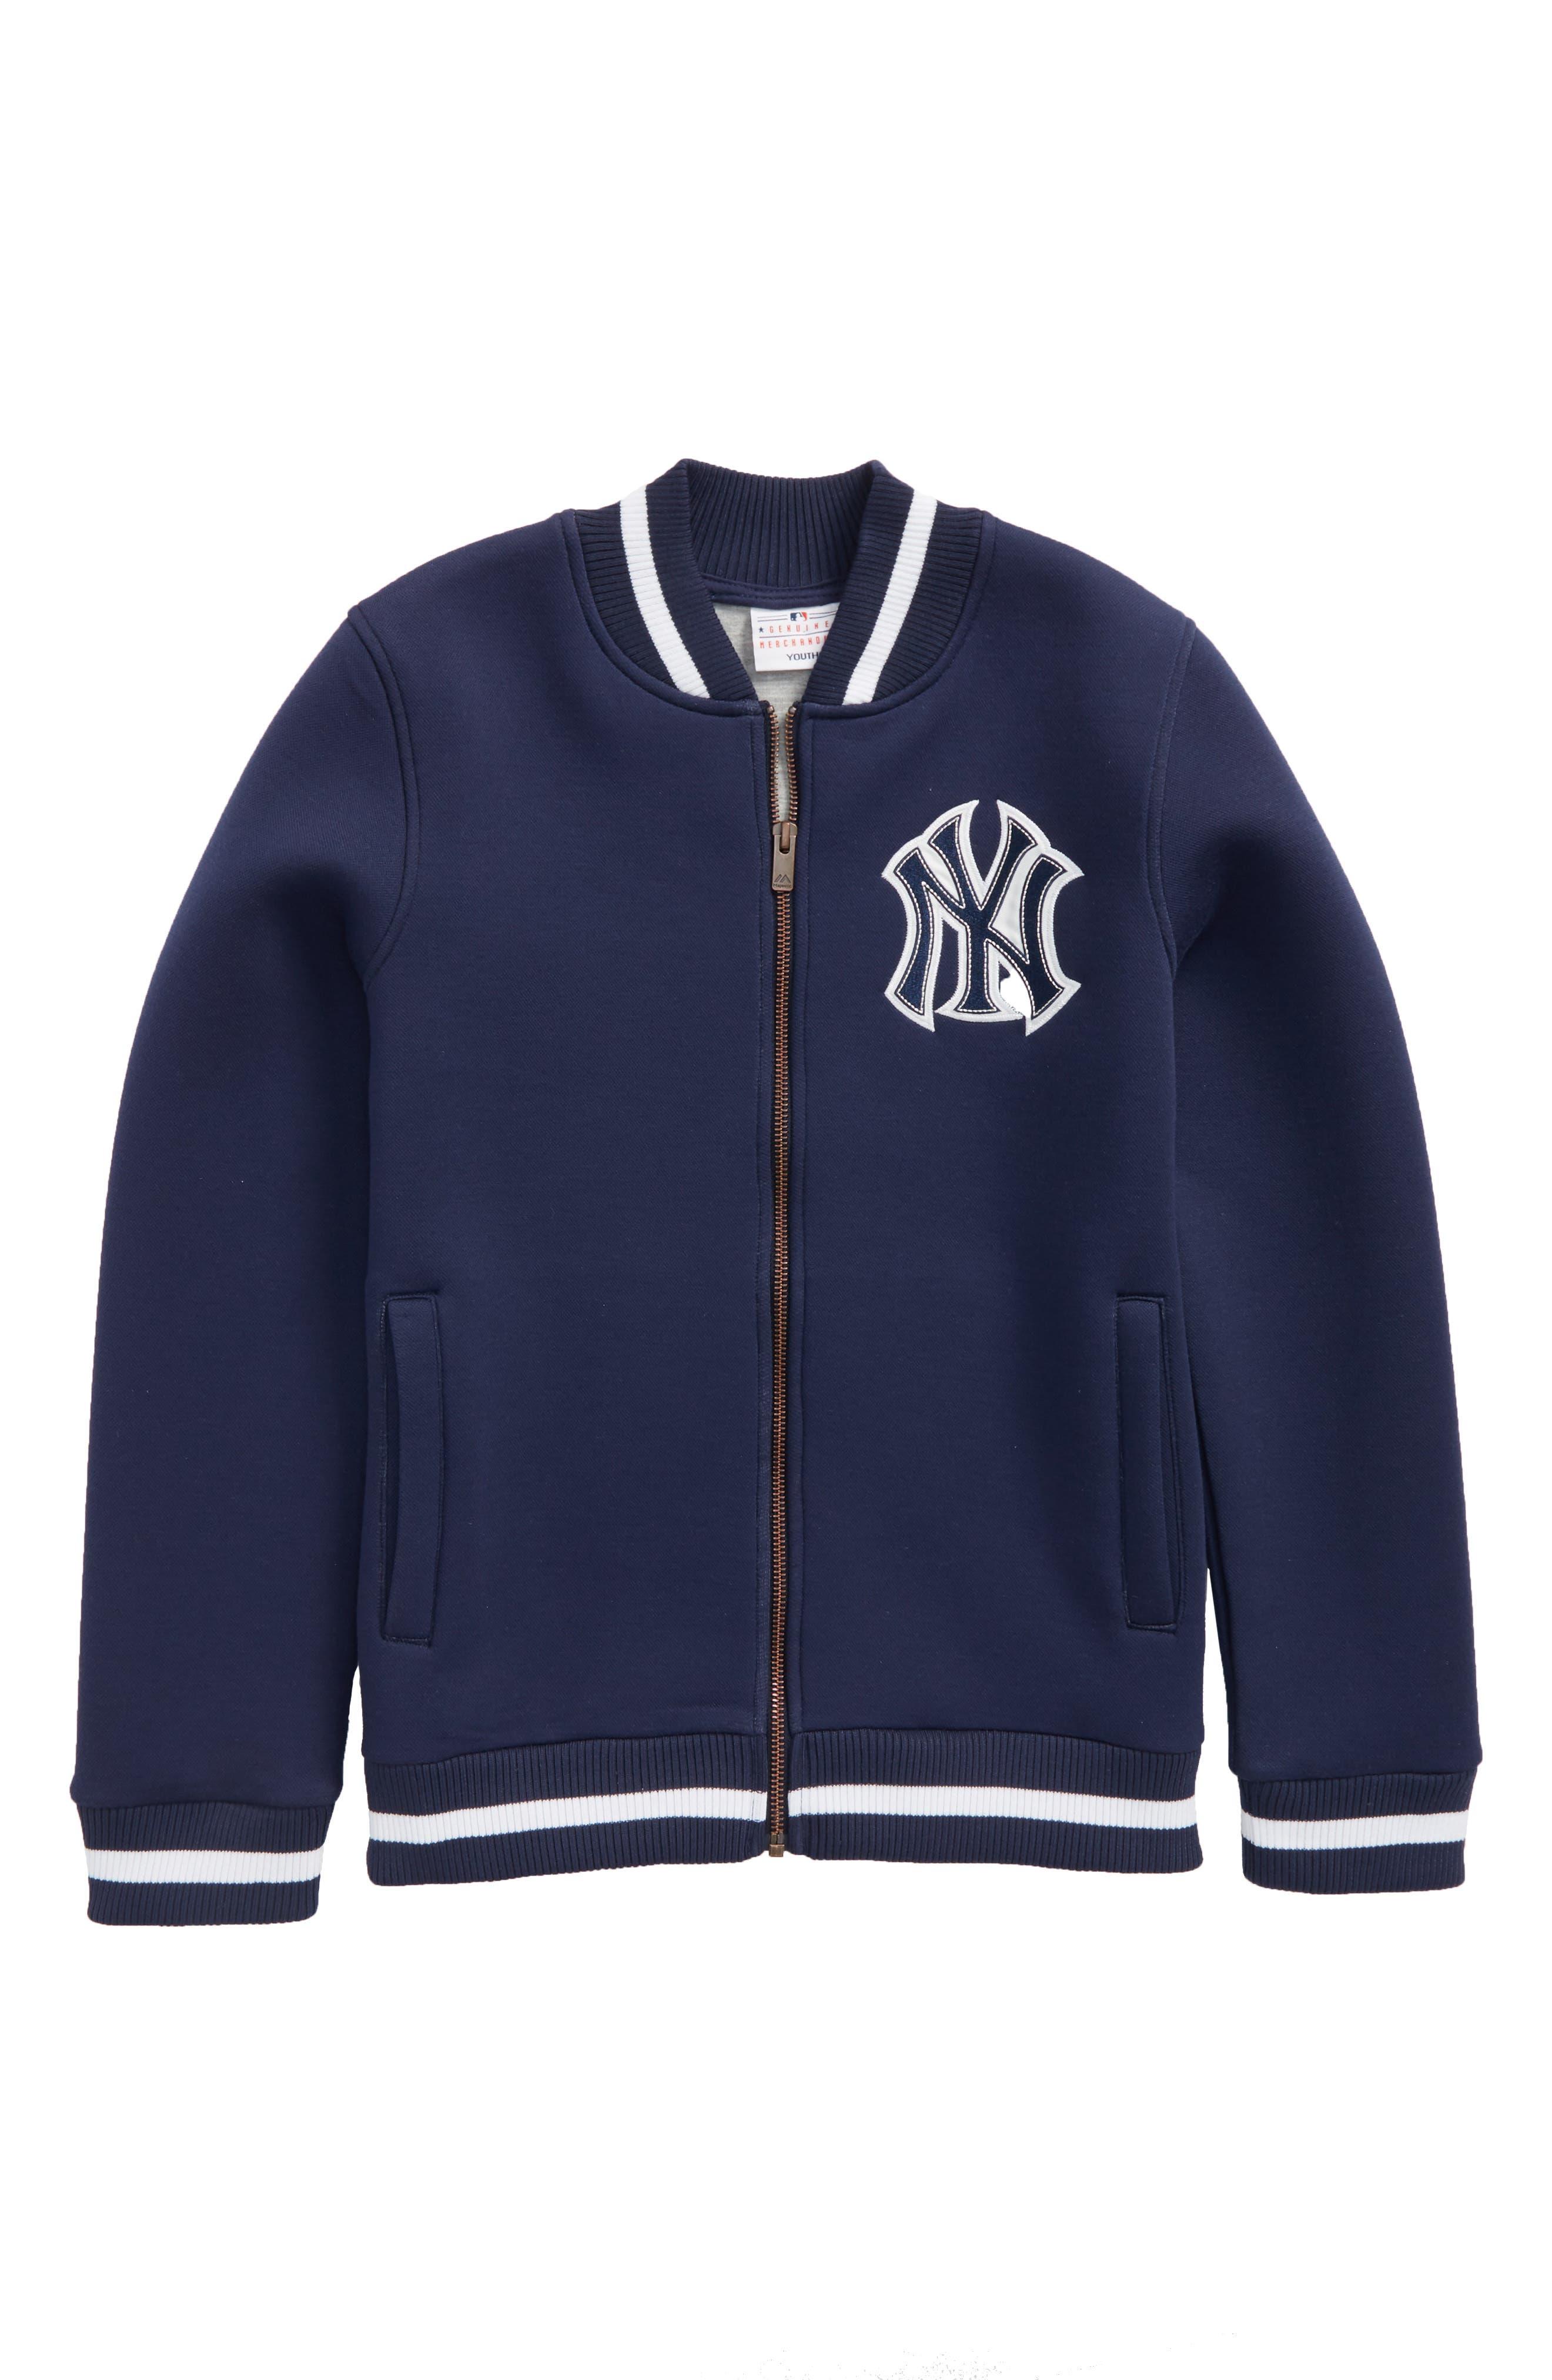 Classical New York Yankees Knit Varsity Jacket,                         Main,                         color,